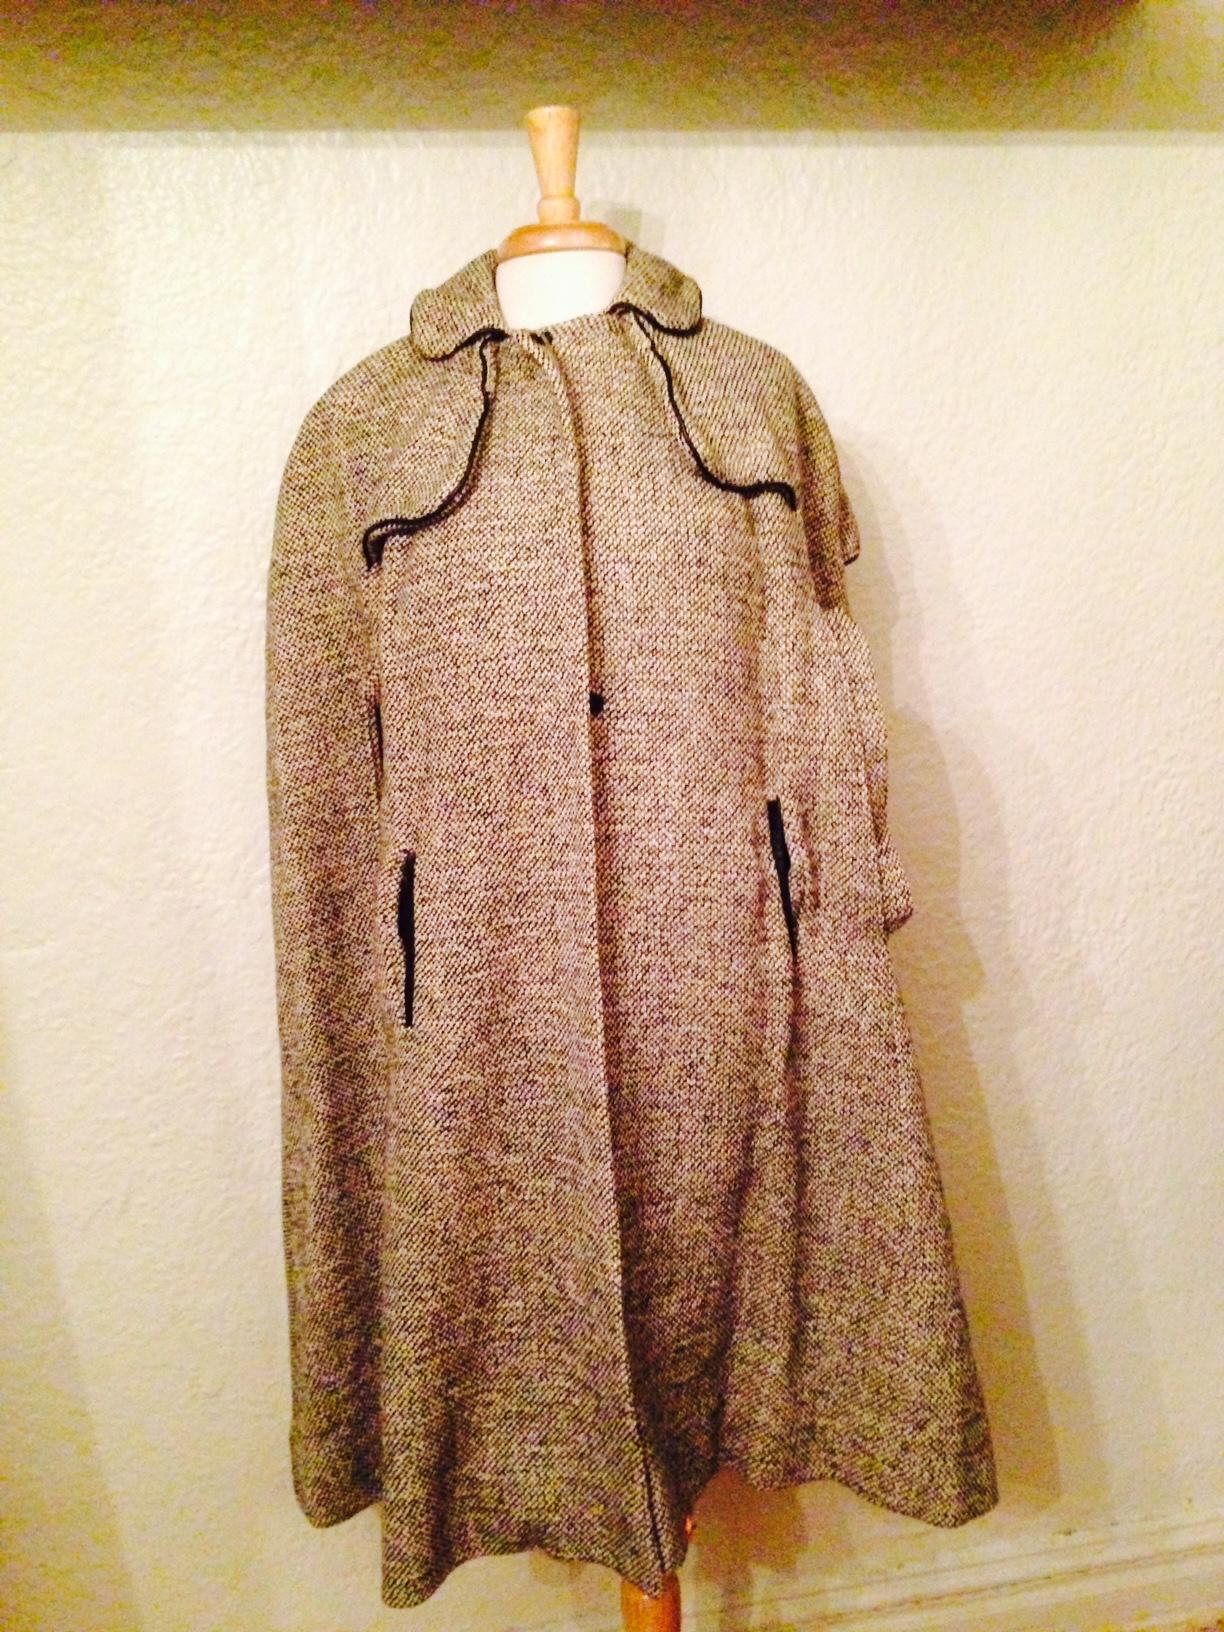 coats – A GOOD LOOK by GoodwillNYNJ